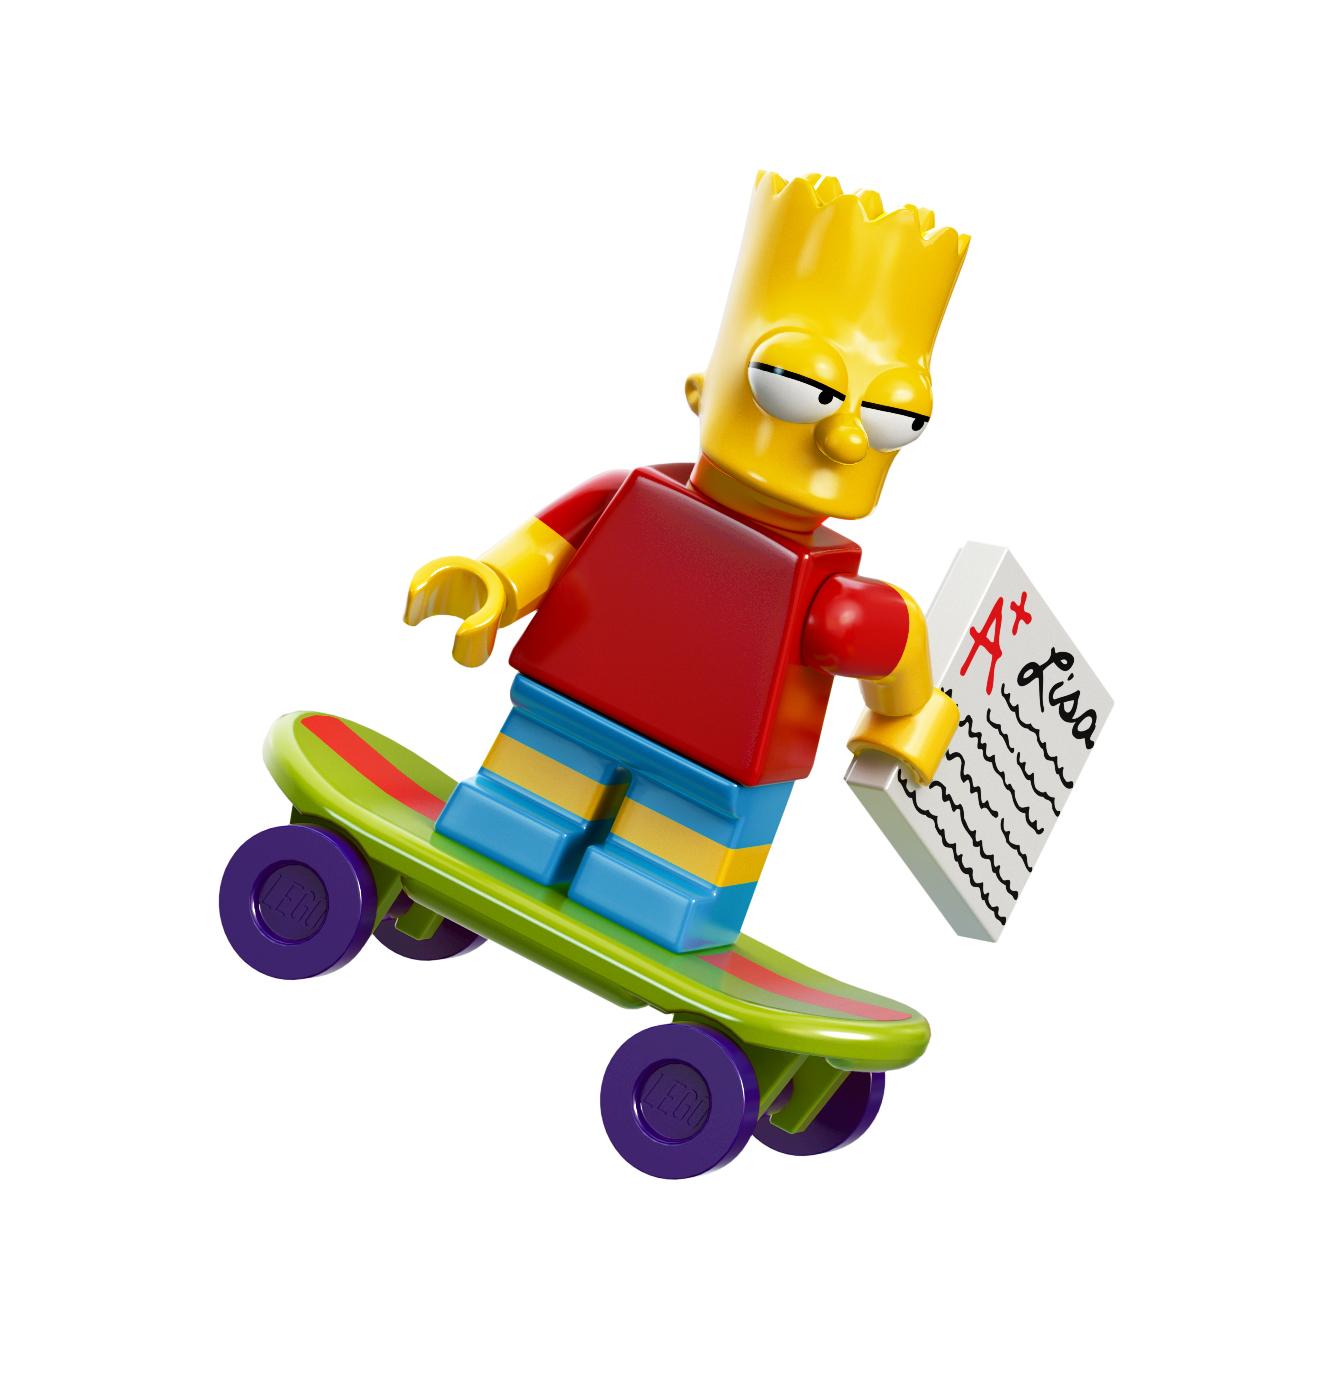 Maison-Lego-Simpsons-028